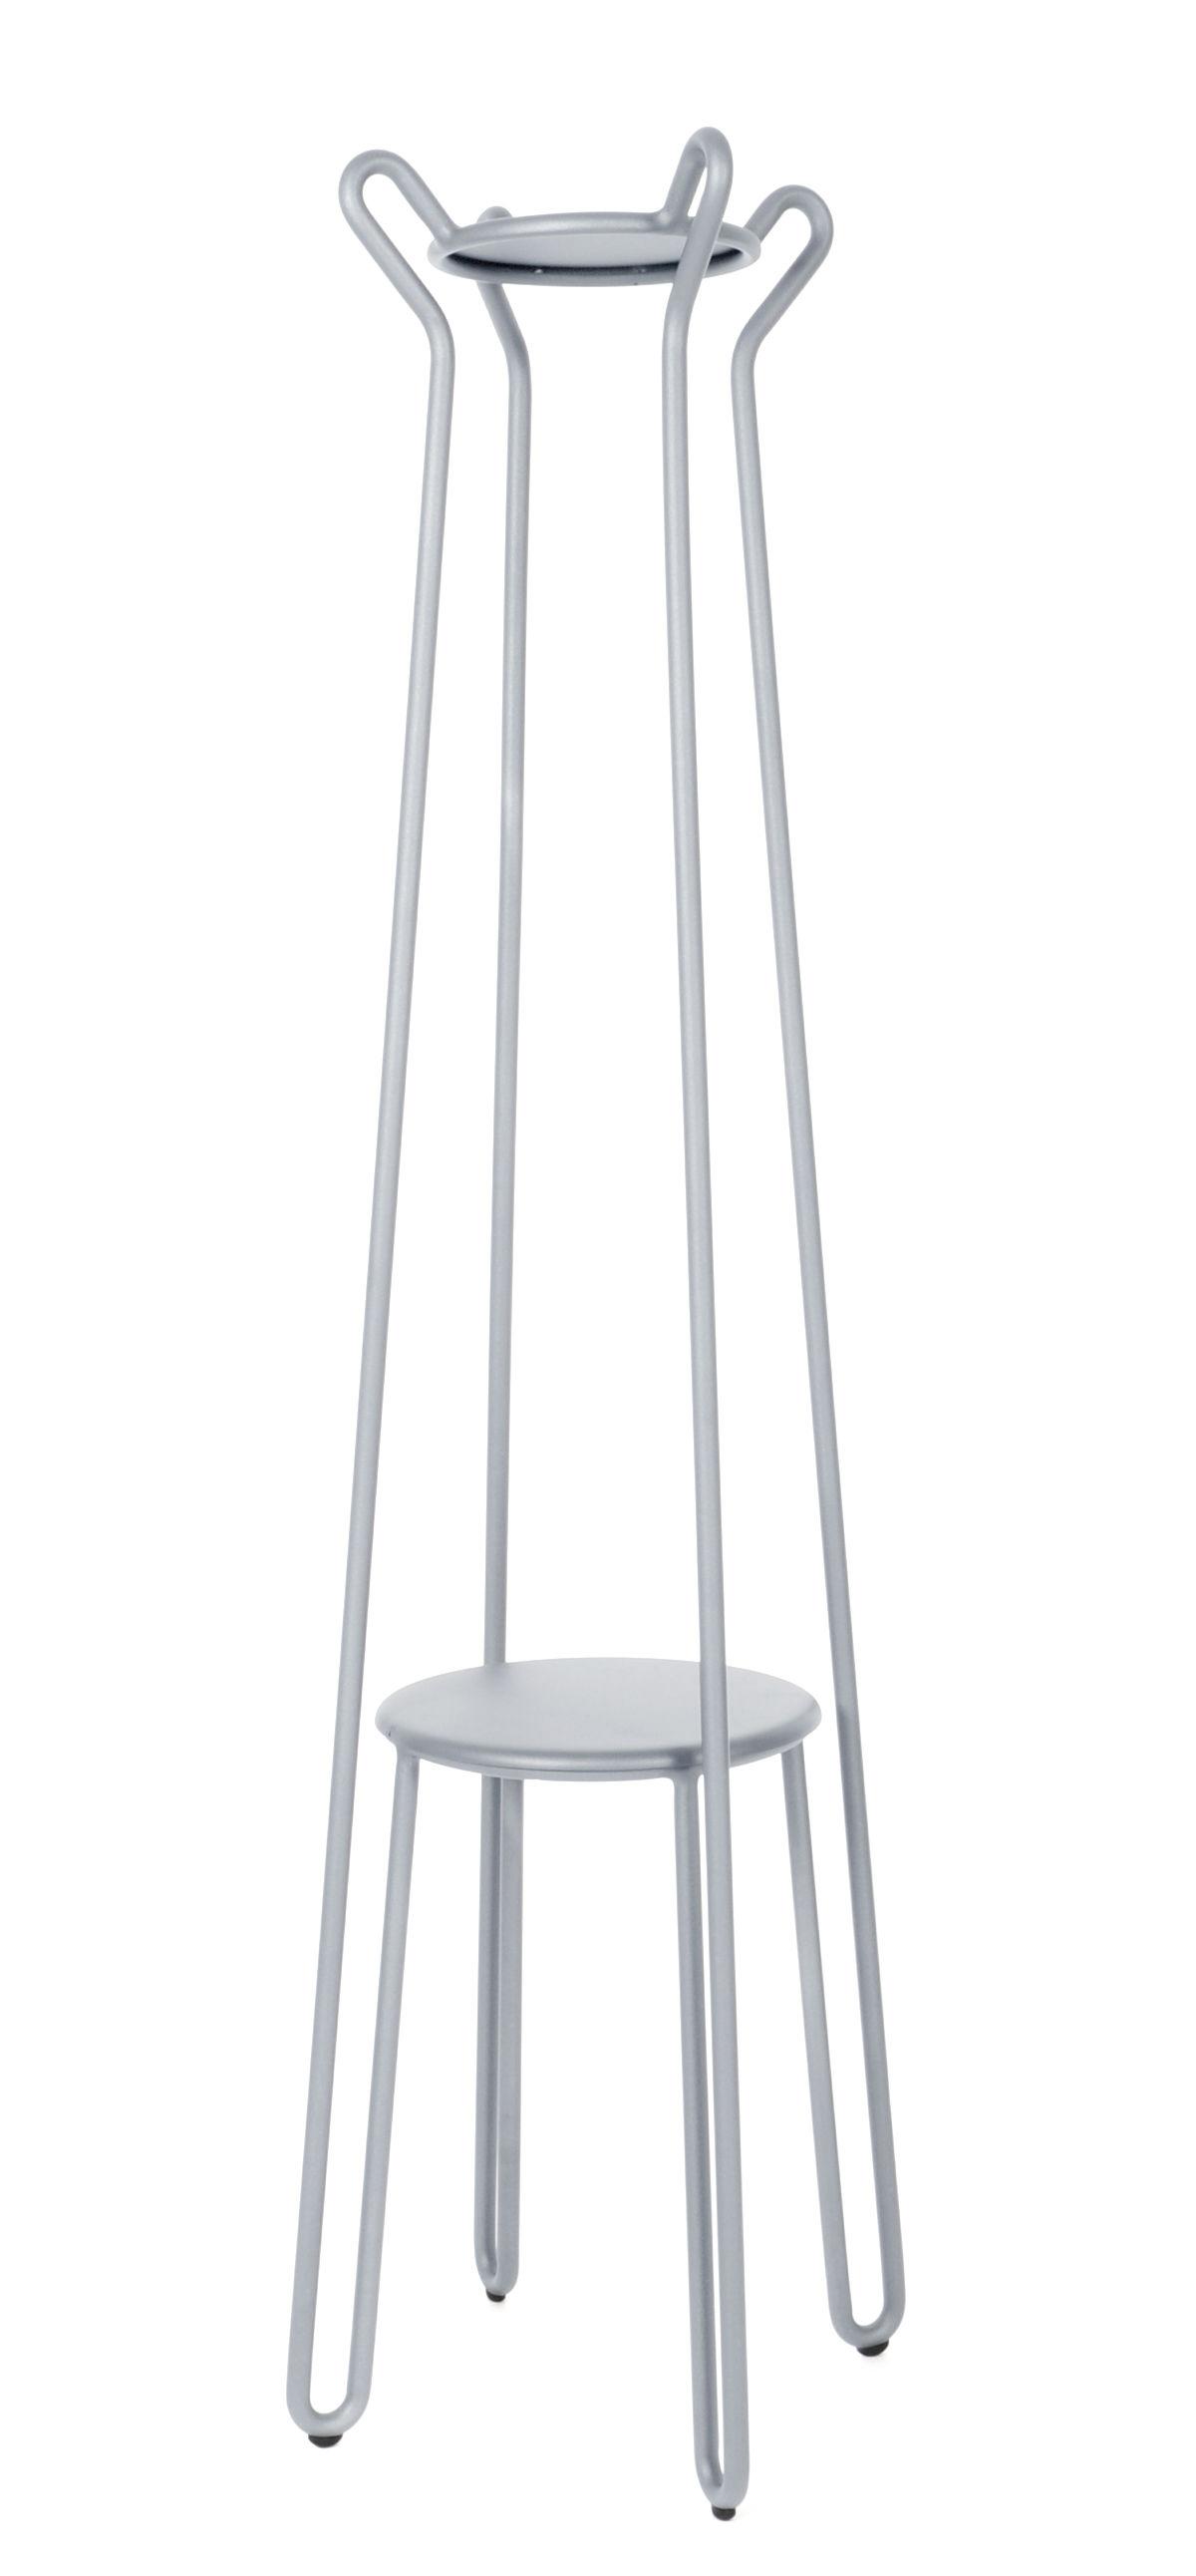 Furniture - Coat Racks & Pegs - Huggy Coat stand - H 178 cm / Aluminium by Maiori - Frosty grey - Lacquered aluminium